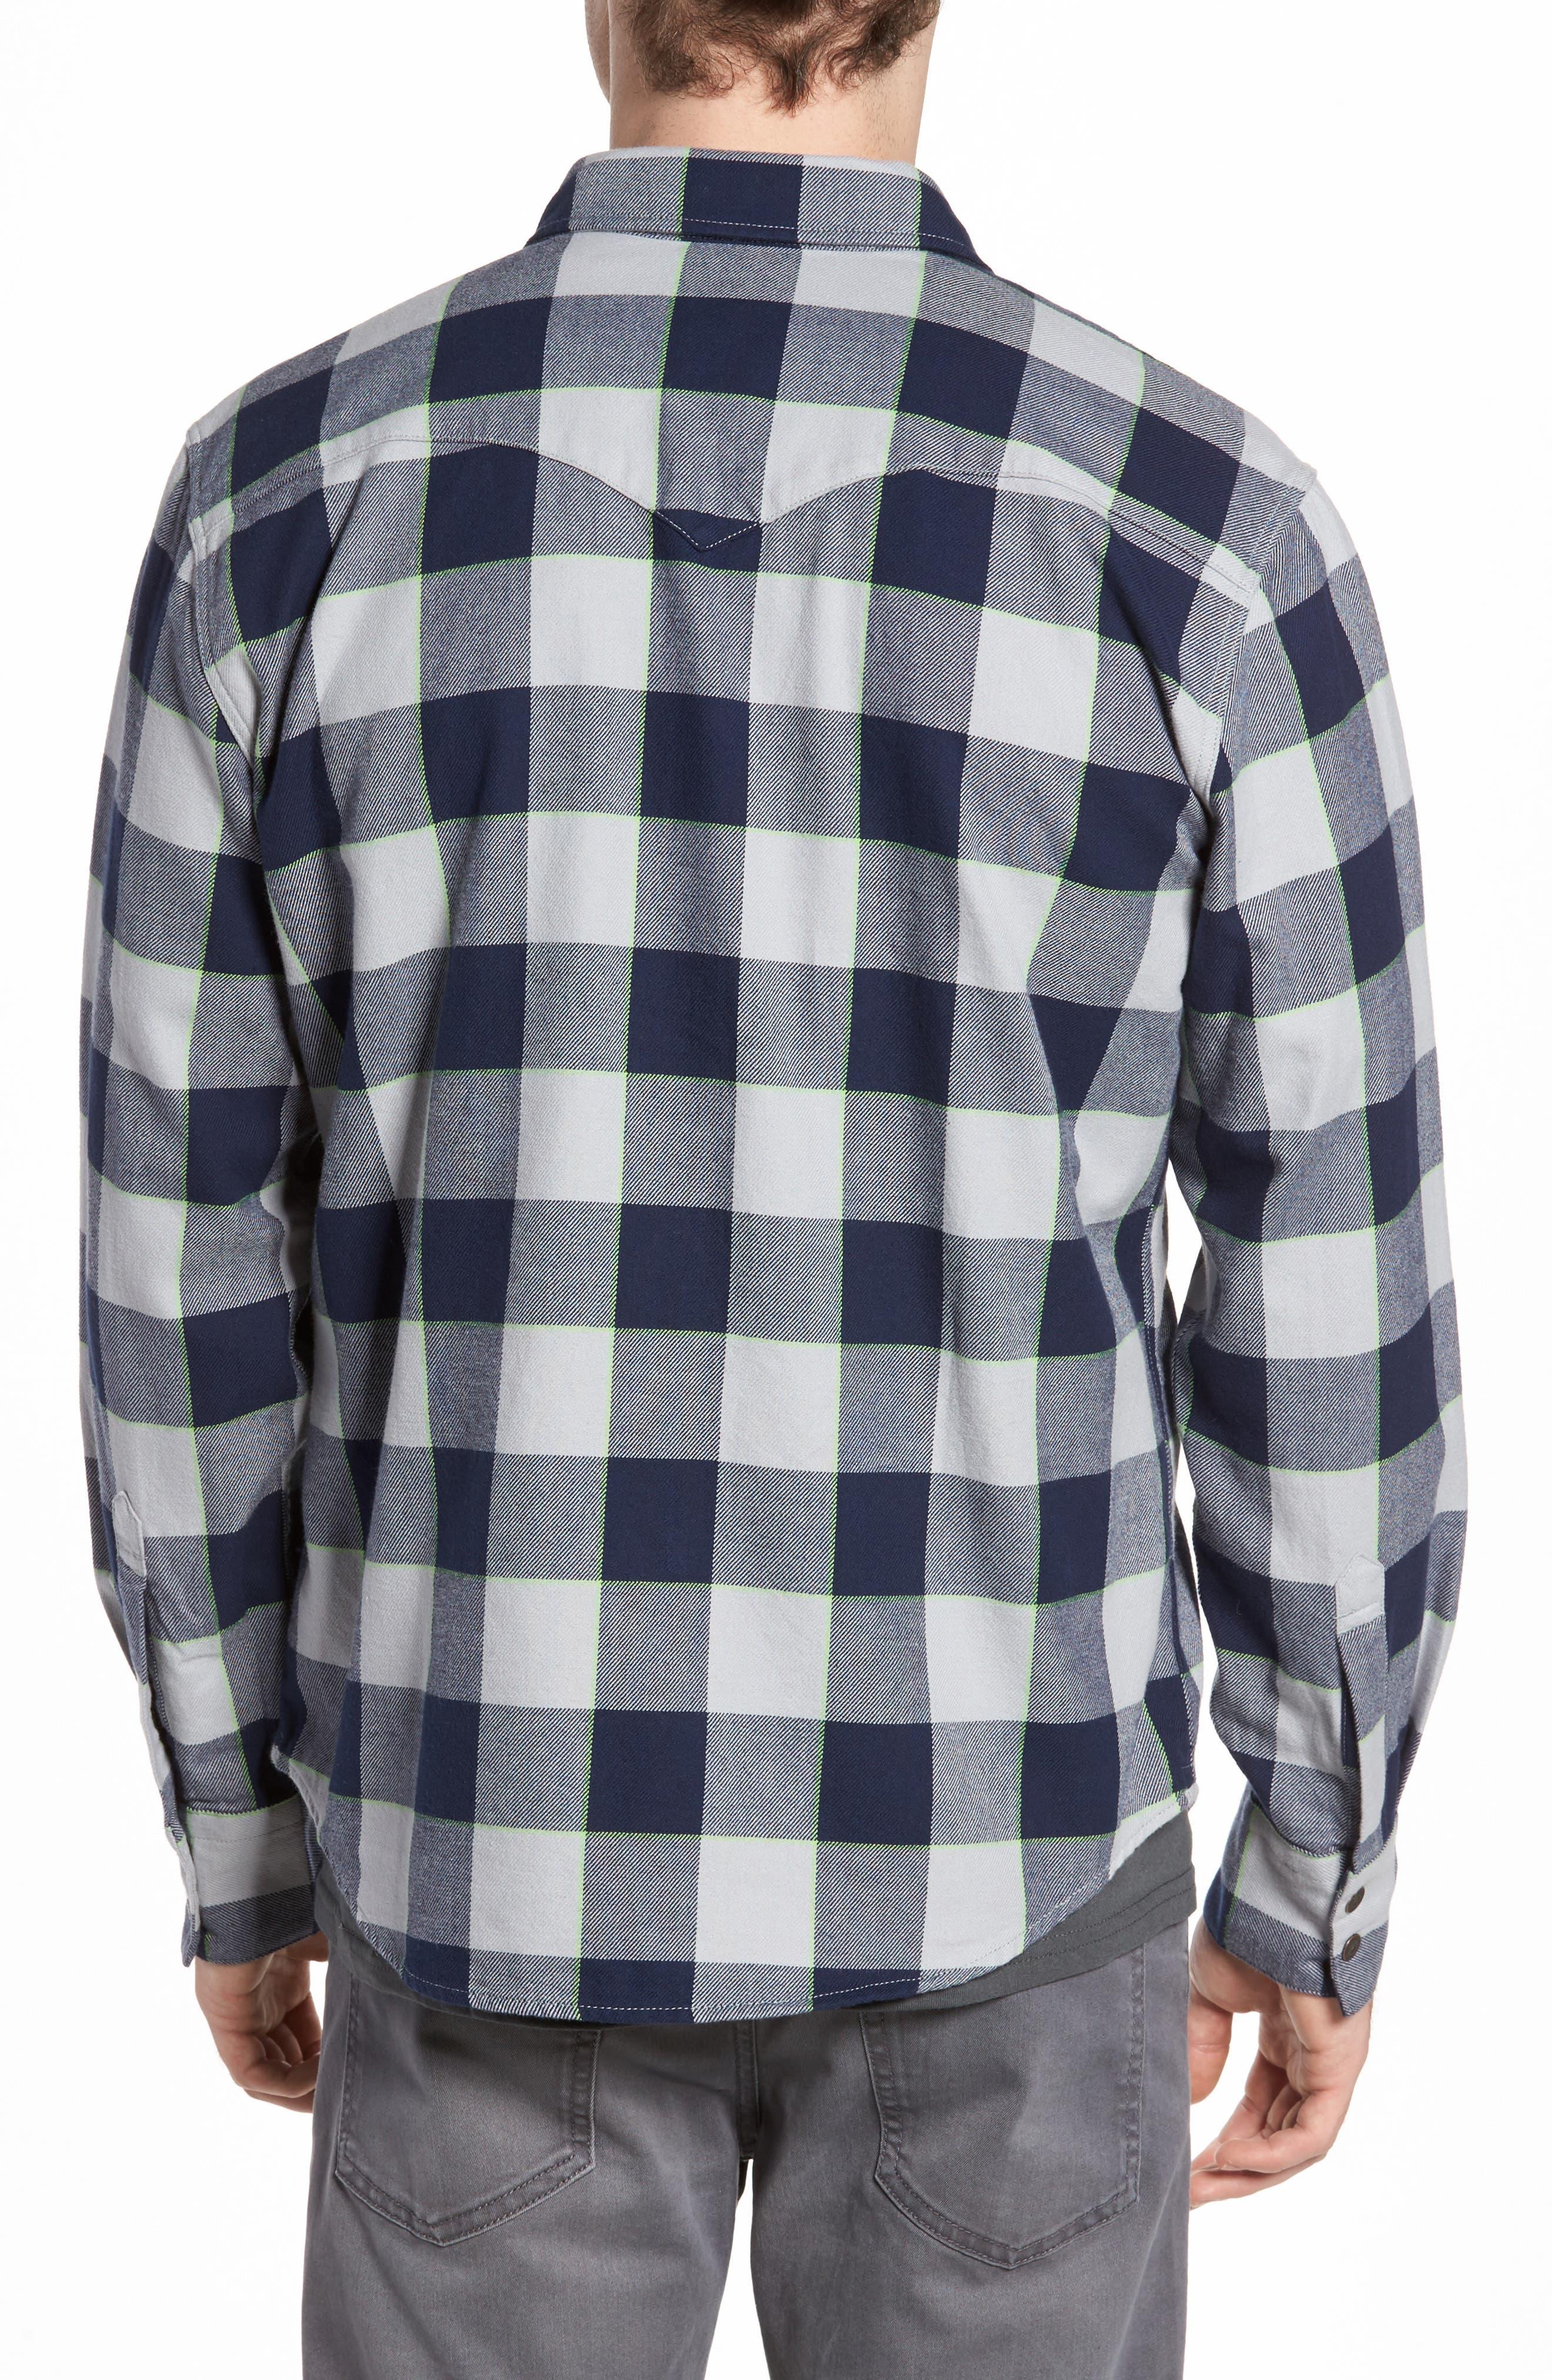 NFL Seahawks - Barstow Plaid Western Shirt,                             Alternate thumbnail 2, color,